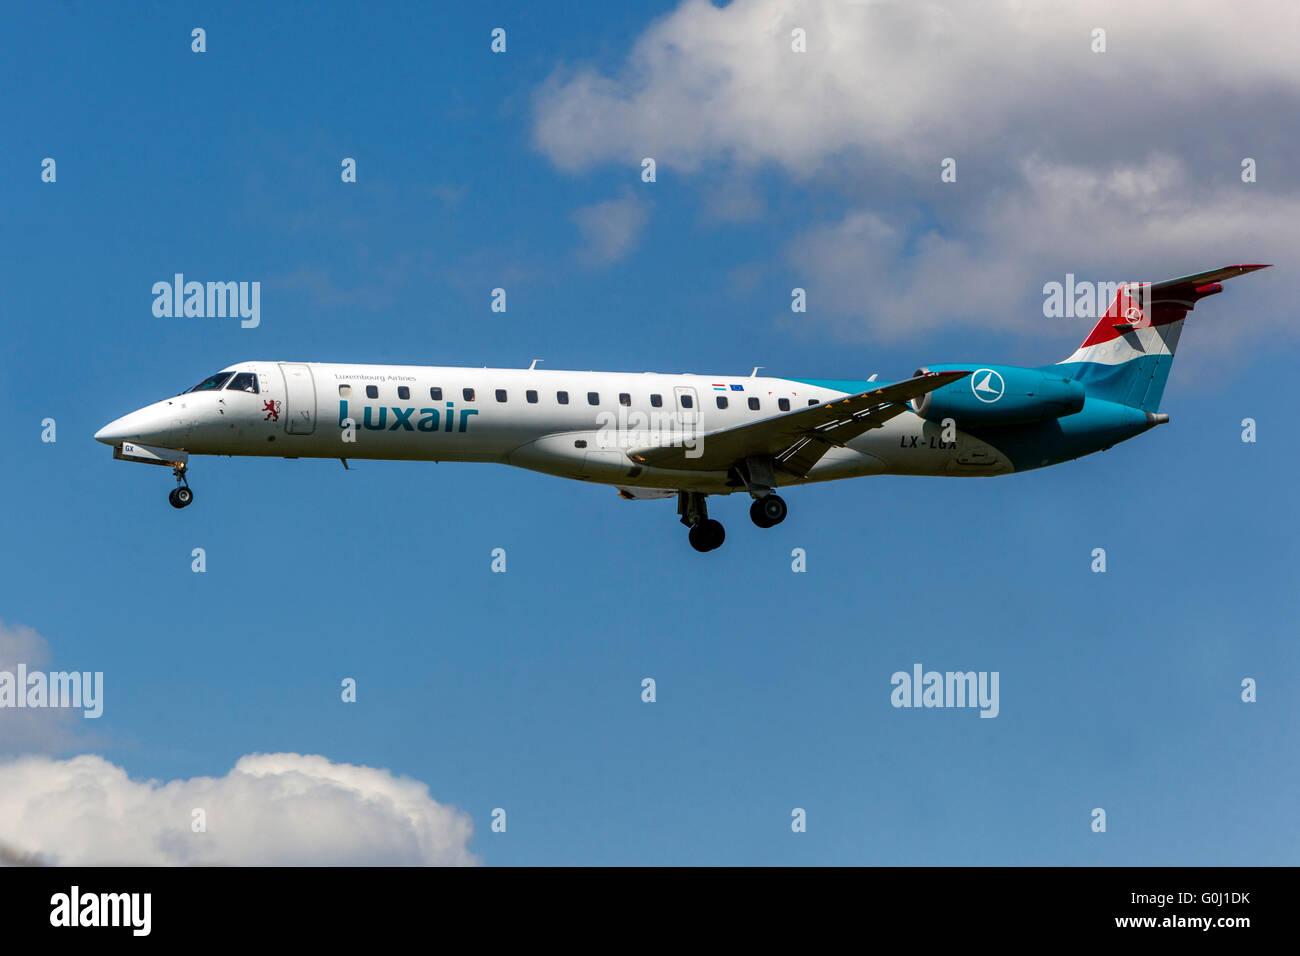 Luxair, Embraer ERJ-145 approaches for landing Prague, Czech Republic - Stock Image